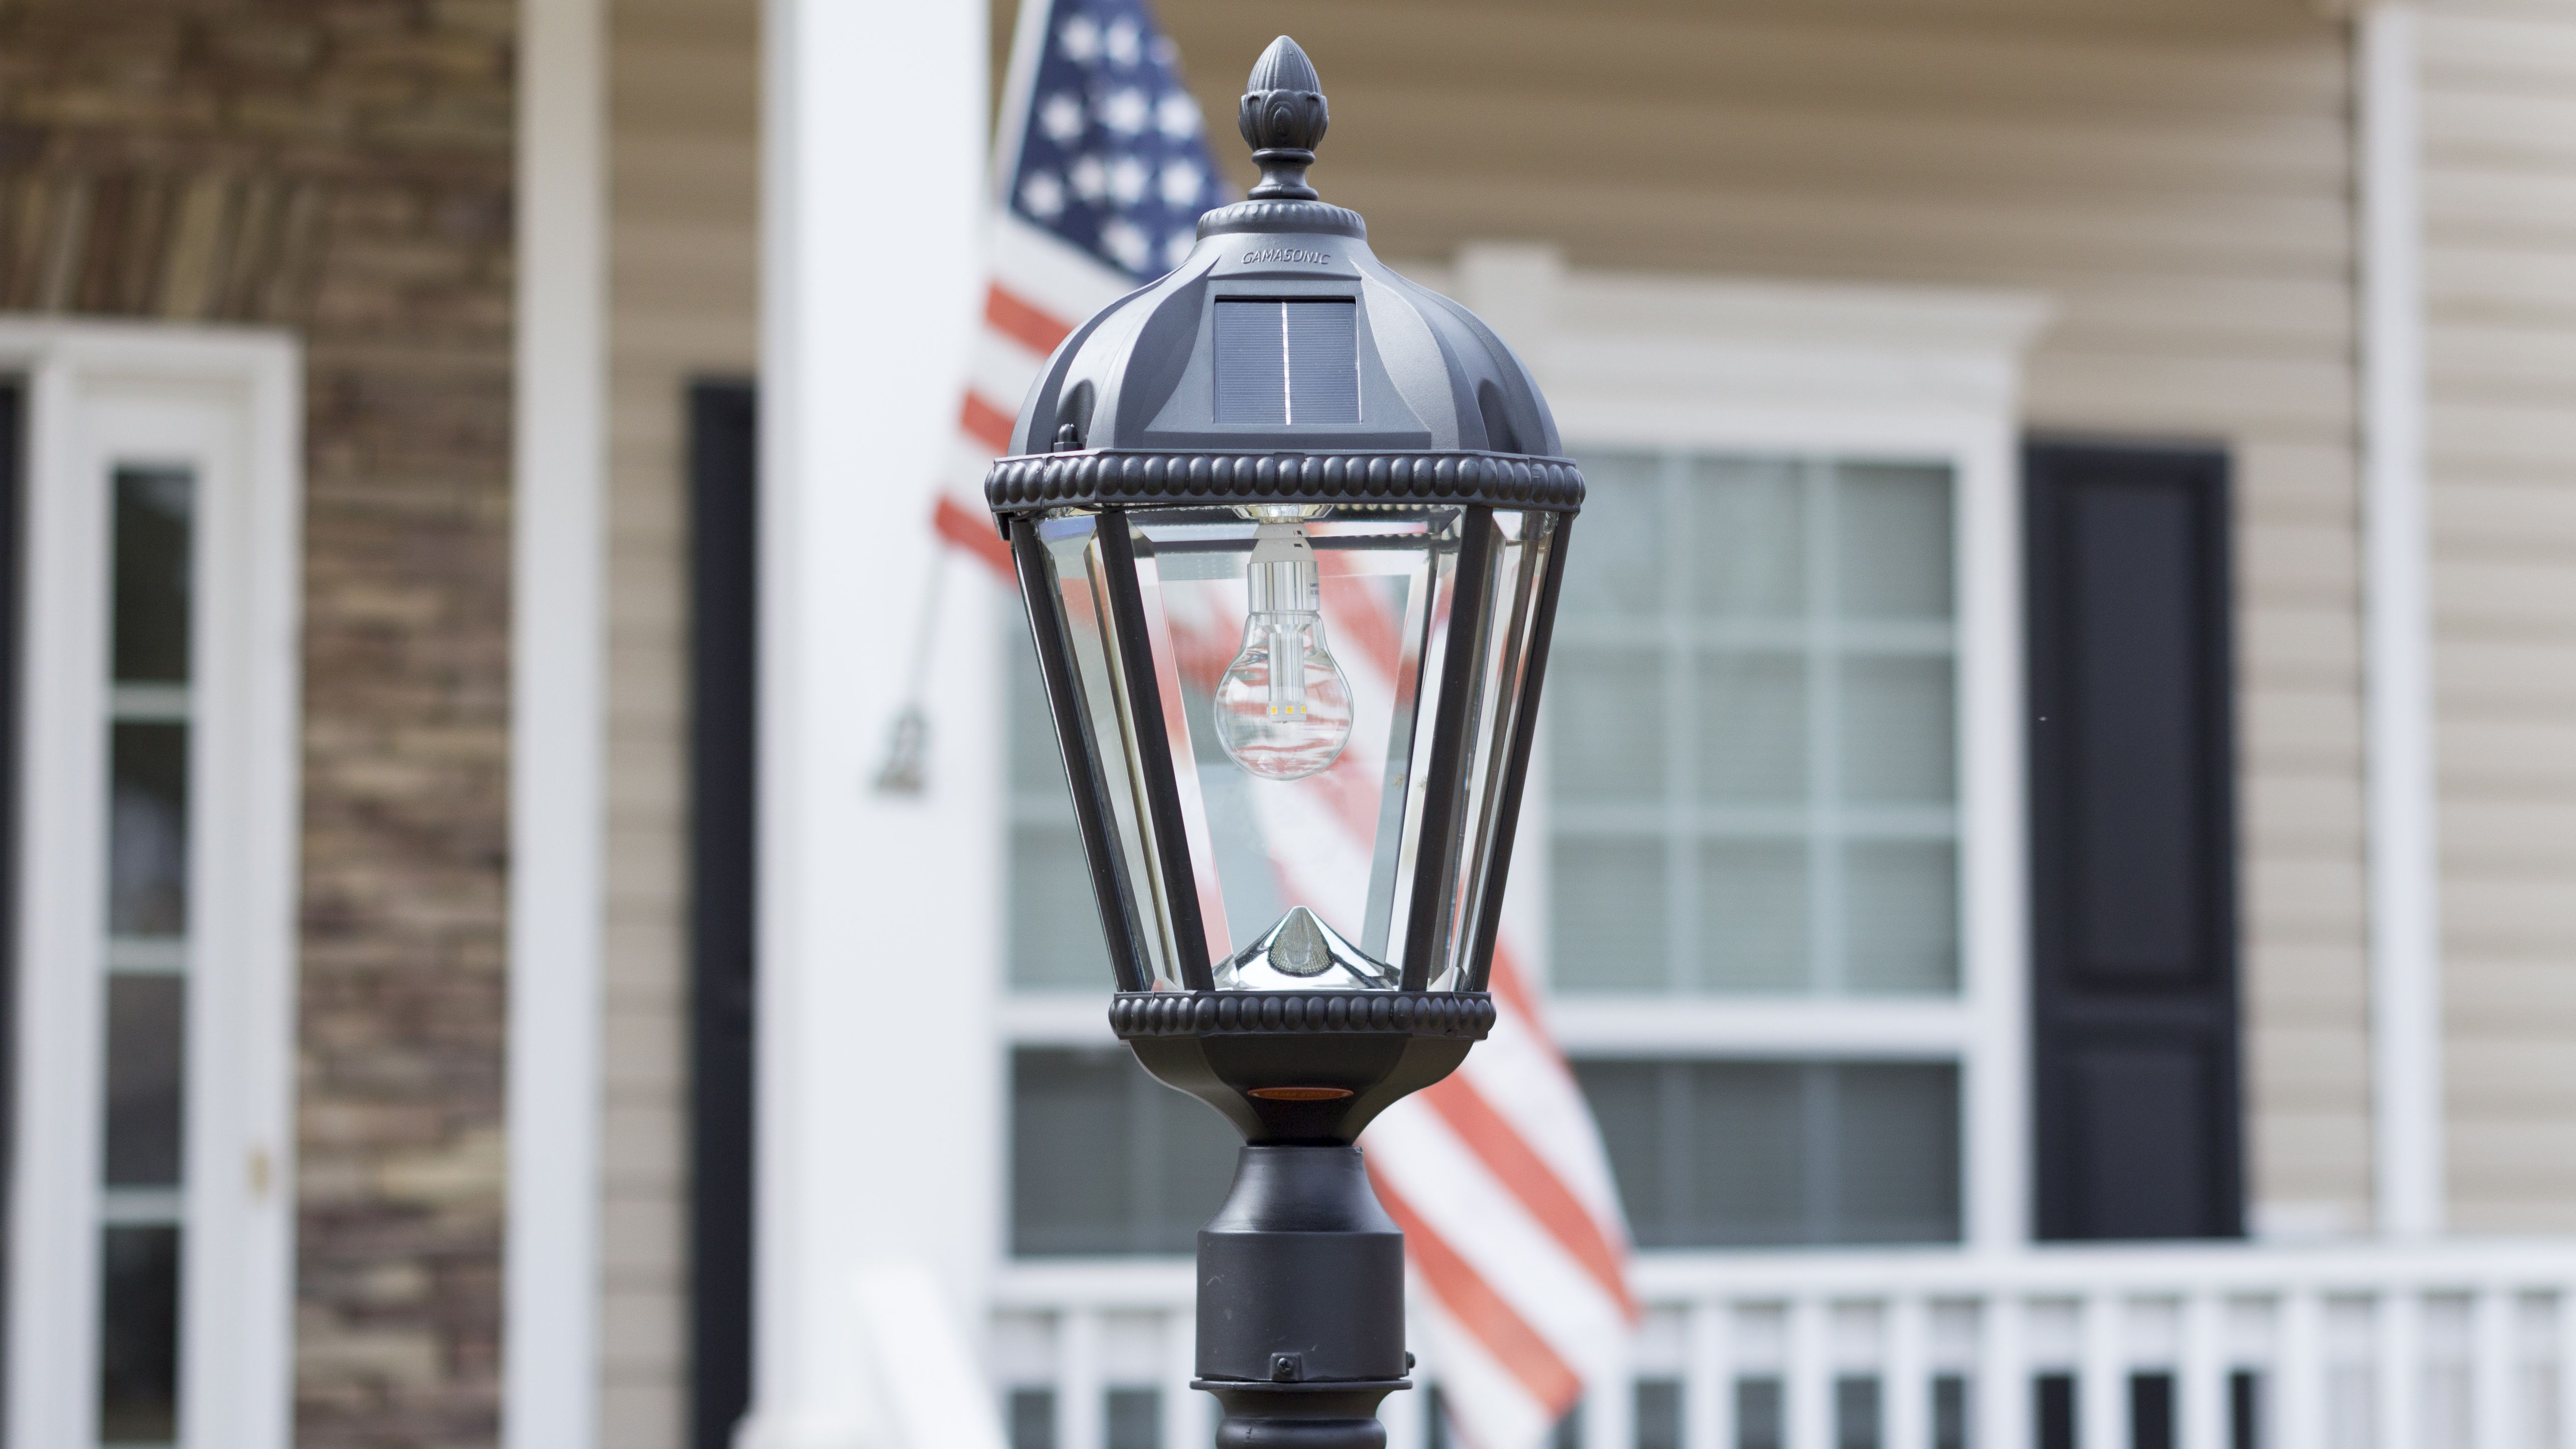 Royal Bulb 3 Fitter Solar Lamp With Gs Solar Led Light Bulb Gs 98b F Solar Led Lights Solar Lamp Post Landscape Lighting